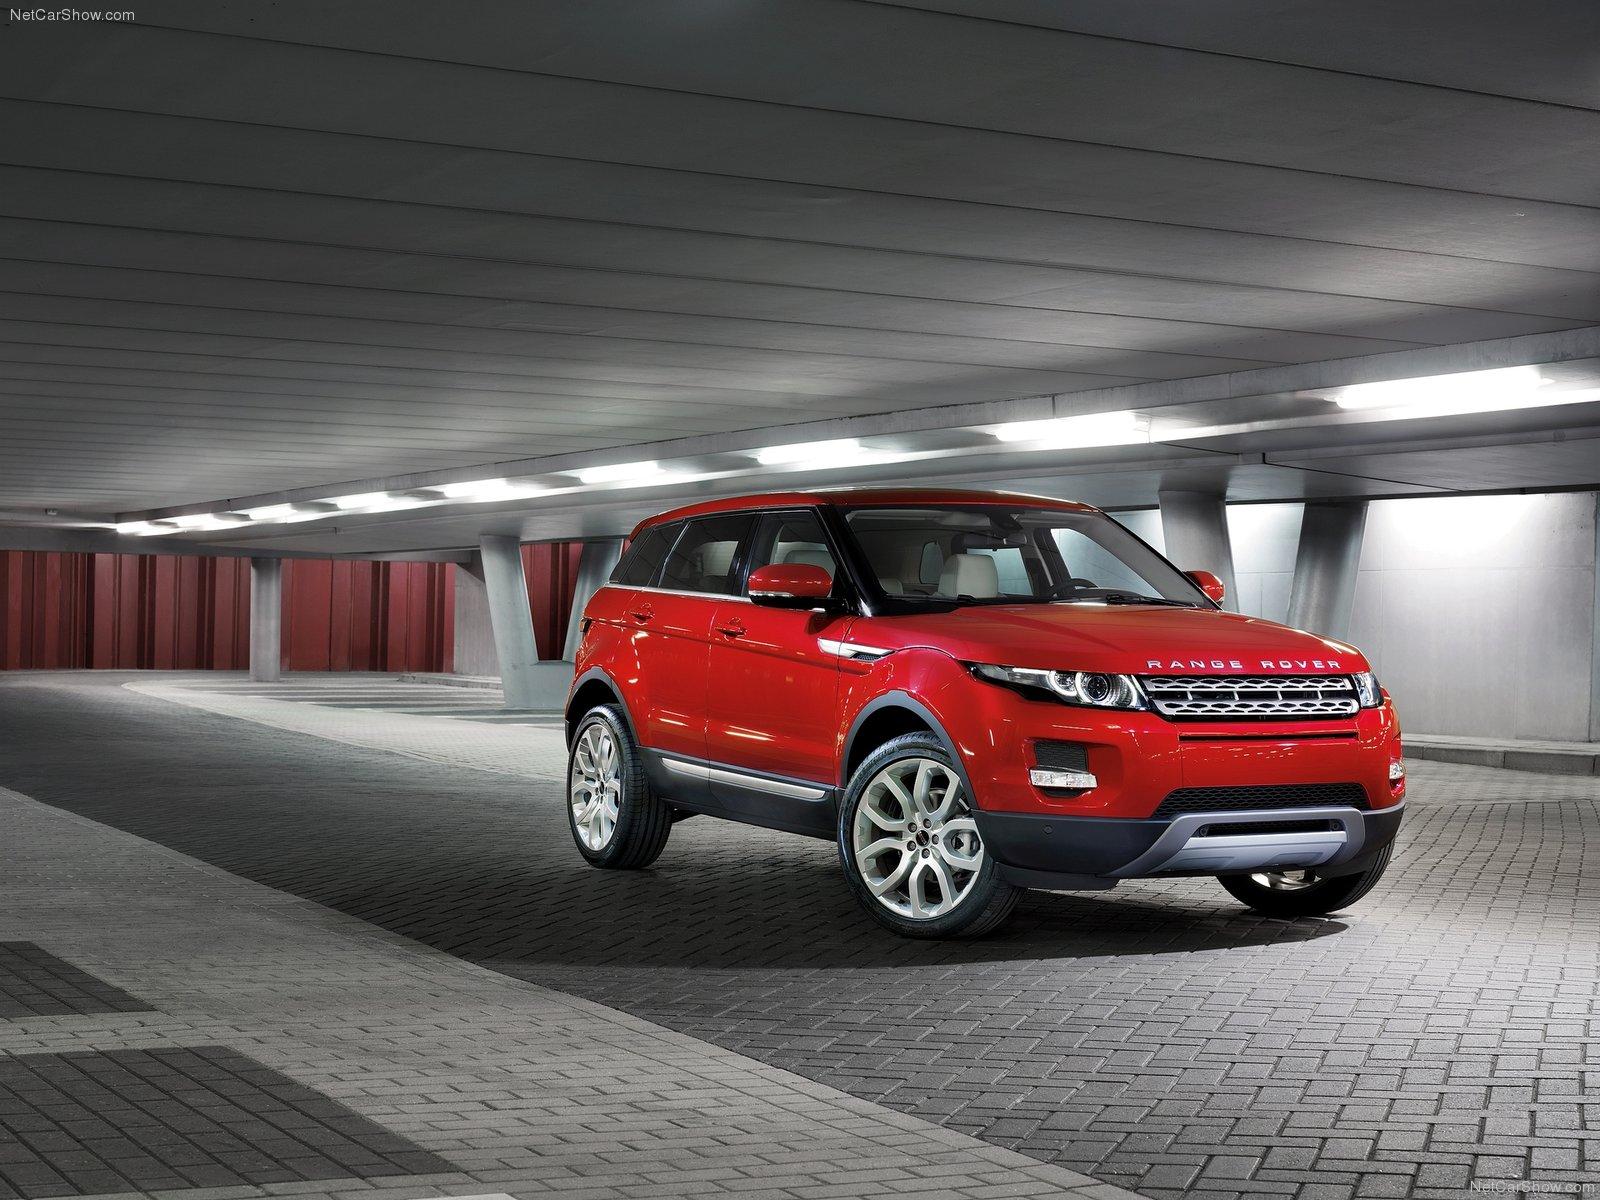 http://4.bp.blogspot.com/_ArqSckmBei0/TNn1q851OwI/AAAAAAAABOg/om_5Or6c-hc/s1600/Land_Rover-Range_Rover_Evoque_5-door_2012_1600x1200_wallpaper_02.jpg